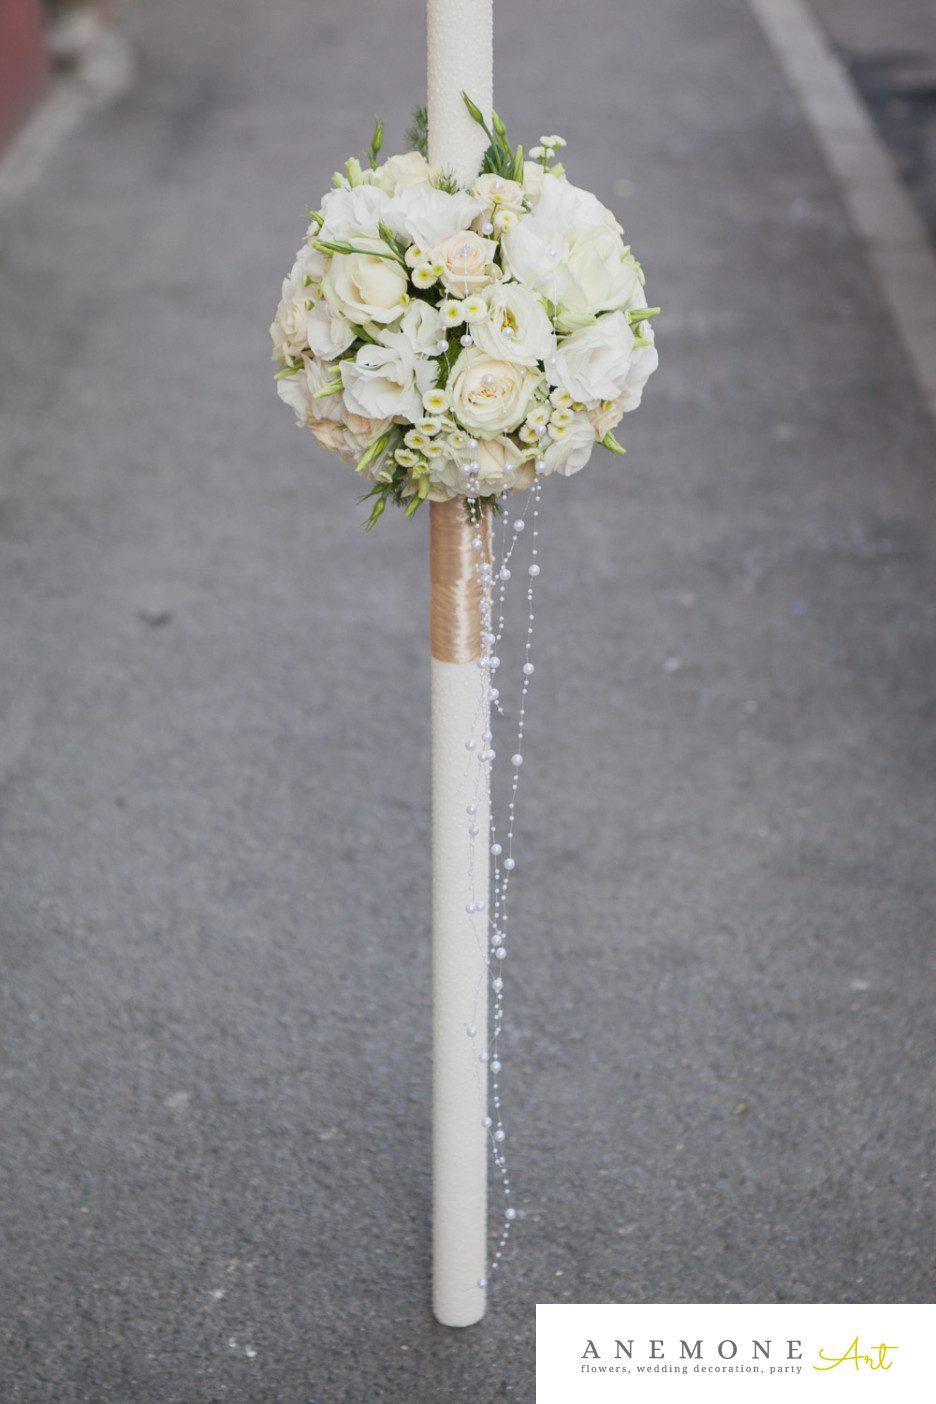 Poza, foto cu Flori de nunta alb, crem, lisianthus, lumanare, matricaria eximia, mini-rosa, perle, trandafiri in Arad, Timisoara, Oradea (wedding flowers, bouquets) nunta Arad, Timisoara, Oradea